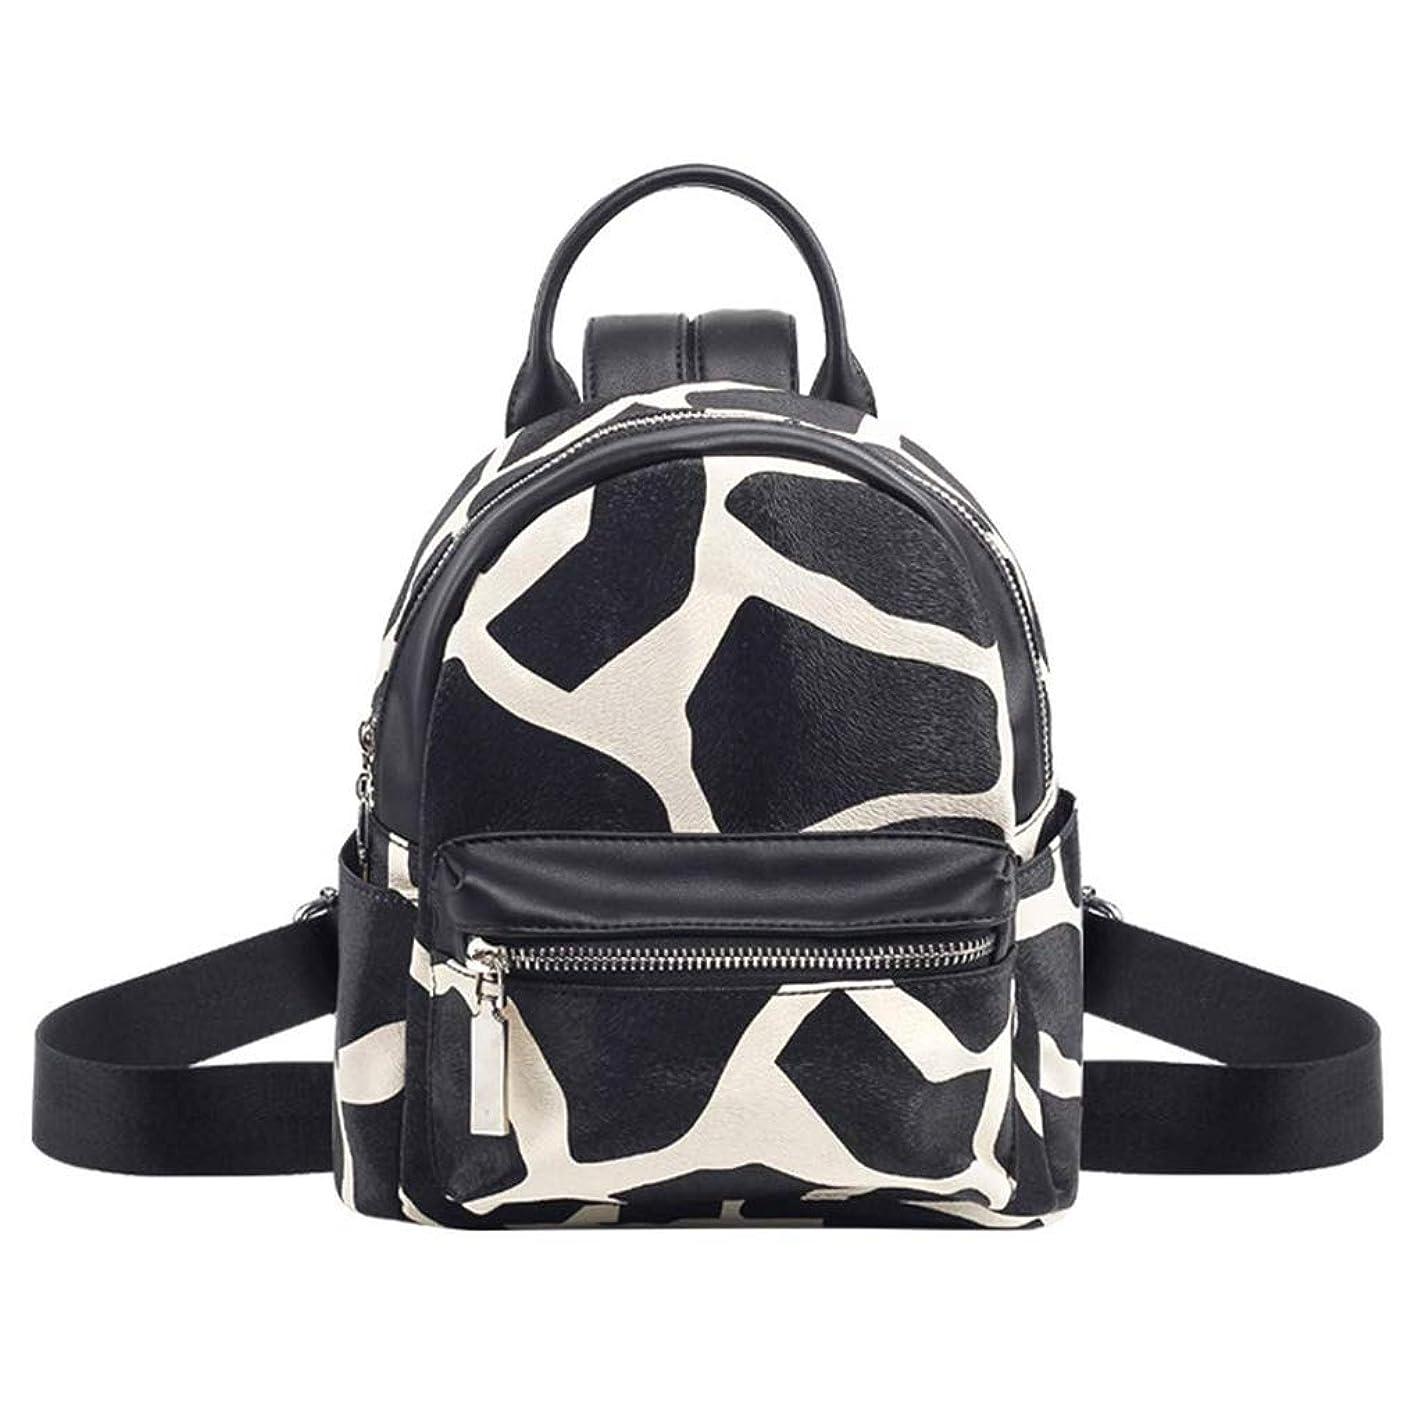 Ebggorgkjo Girl Backpack Cow Pattern Backpack Women Small Backpack Fashion Daypack Trendy Leather Kids Backpack (Black) (Color : Schwarz, Size : -)